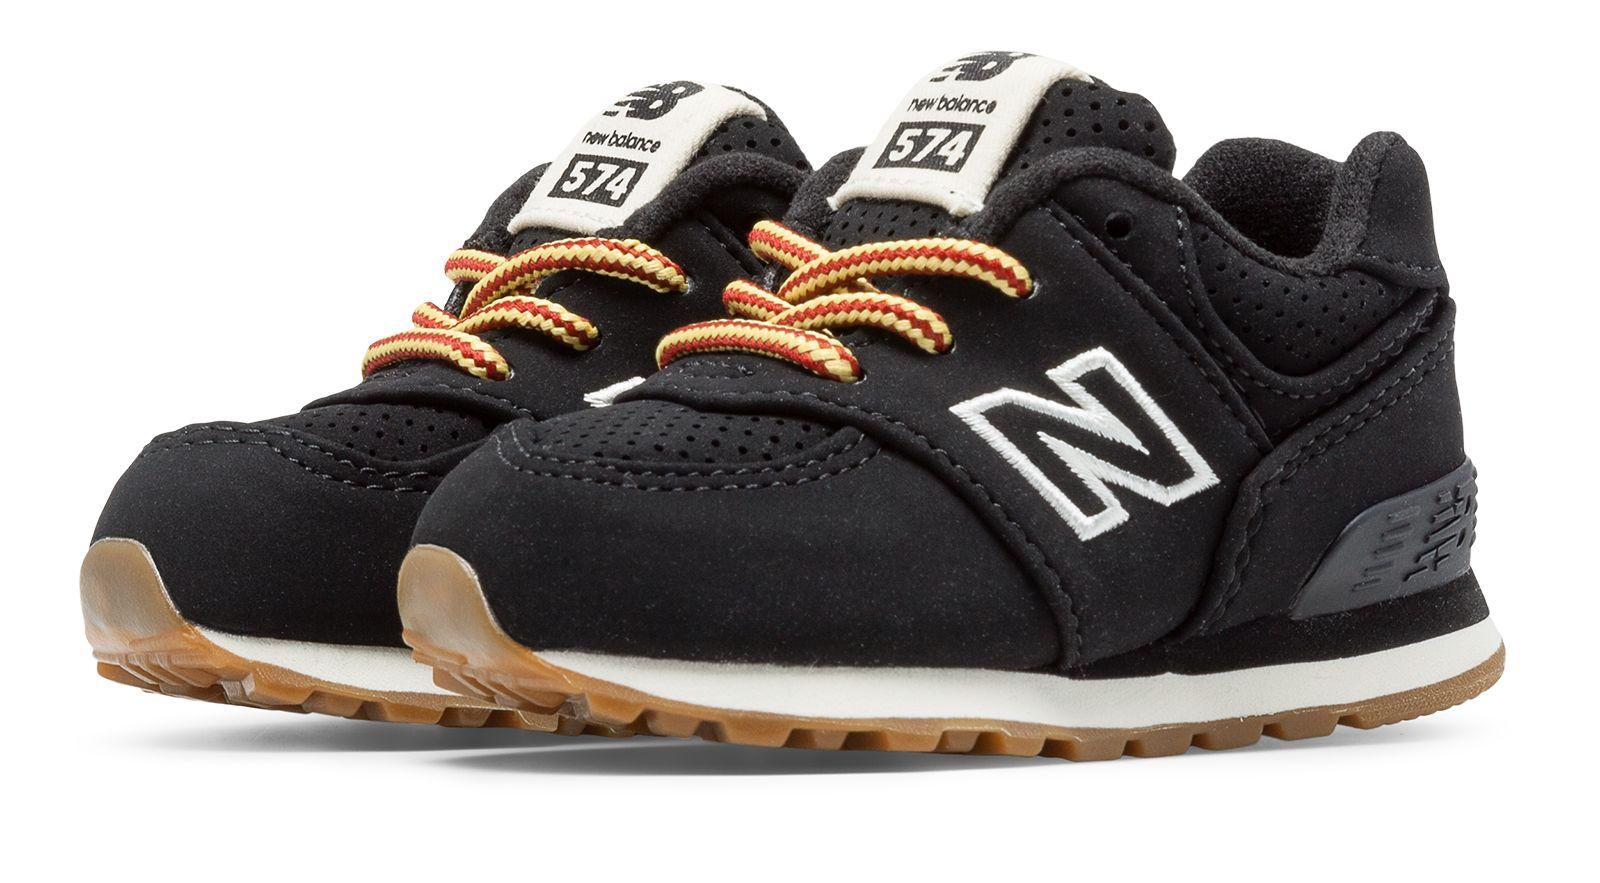 New Balance 574 Heritage Sport Infant Boys Shoes Black